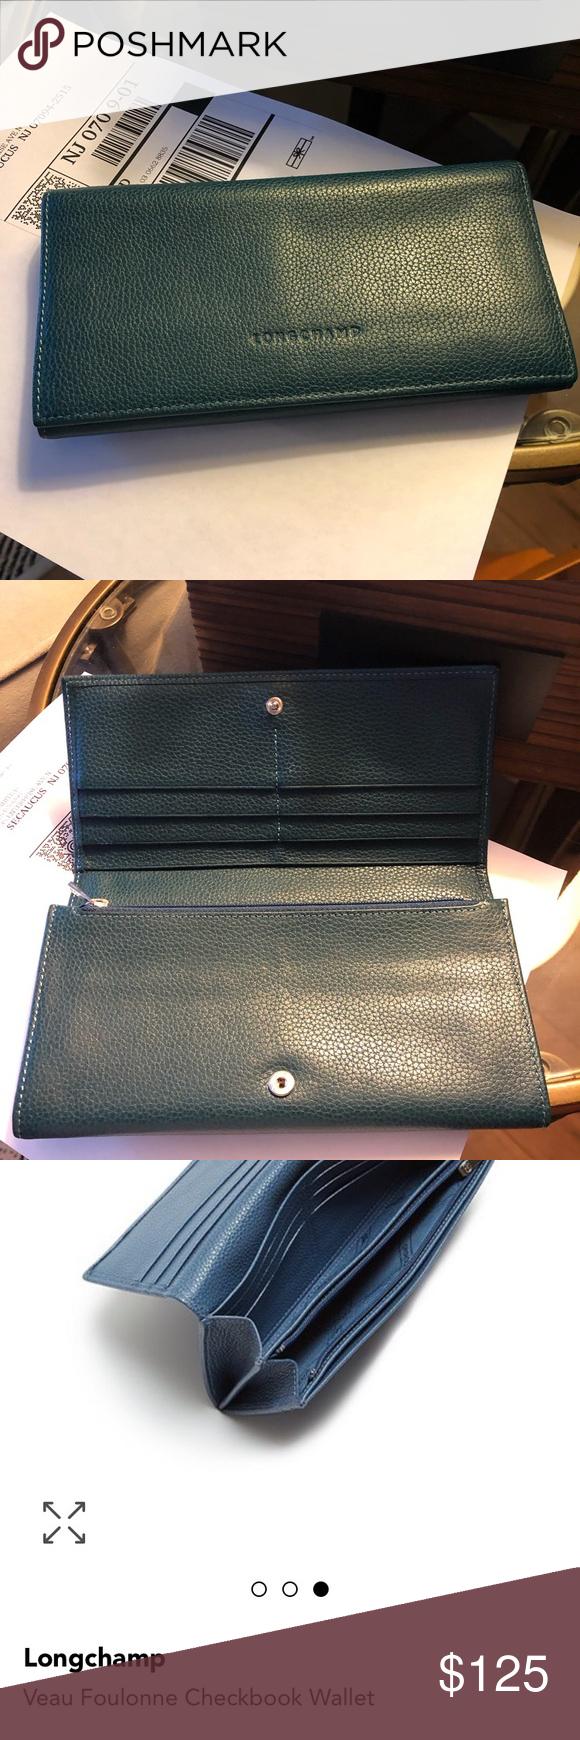 Mint Longchamp Teal Veau Foulonne Checkbook Wallet | Checkbook ...